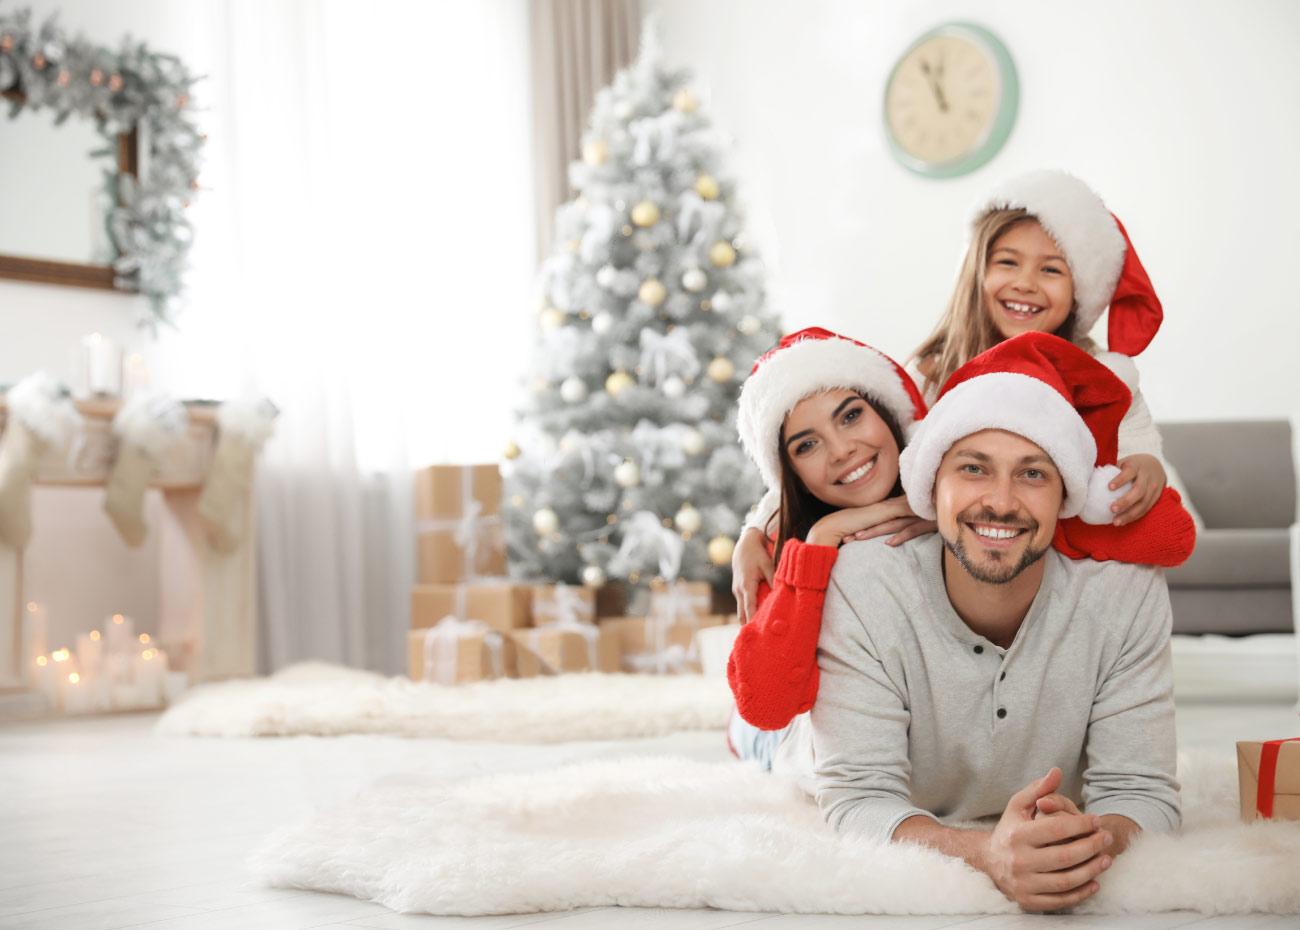 schoko-kids-club-weihnachtsaktion-bg-family